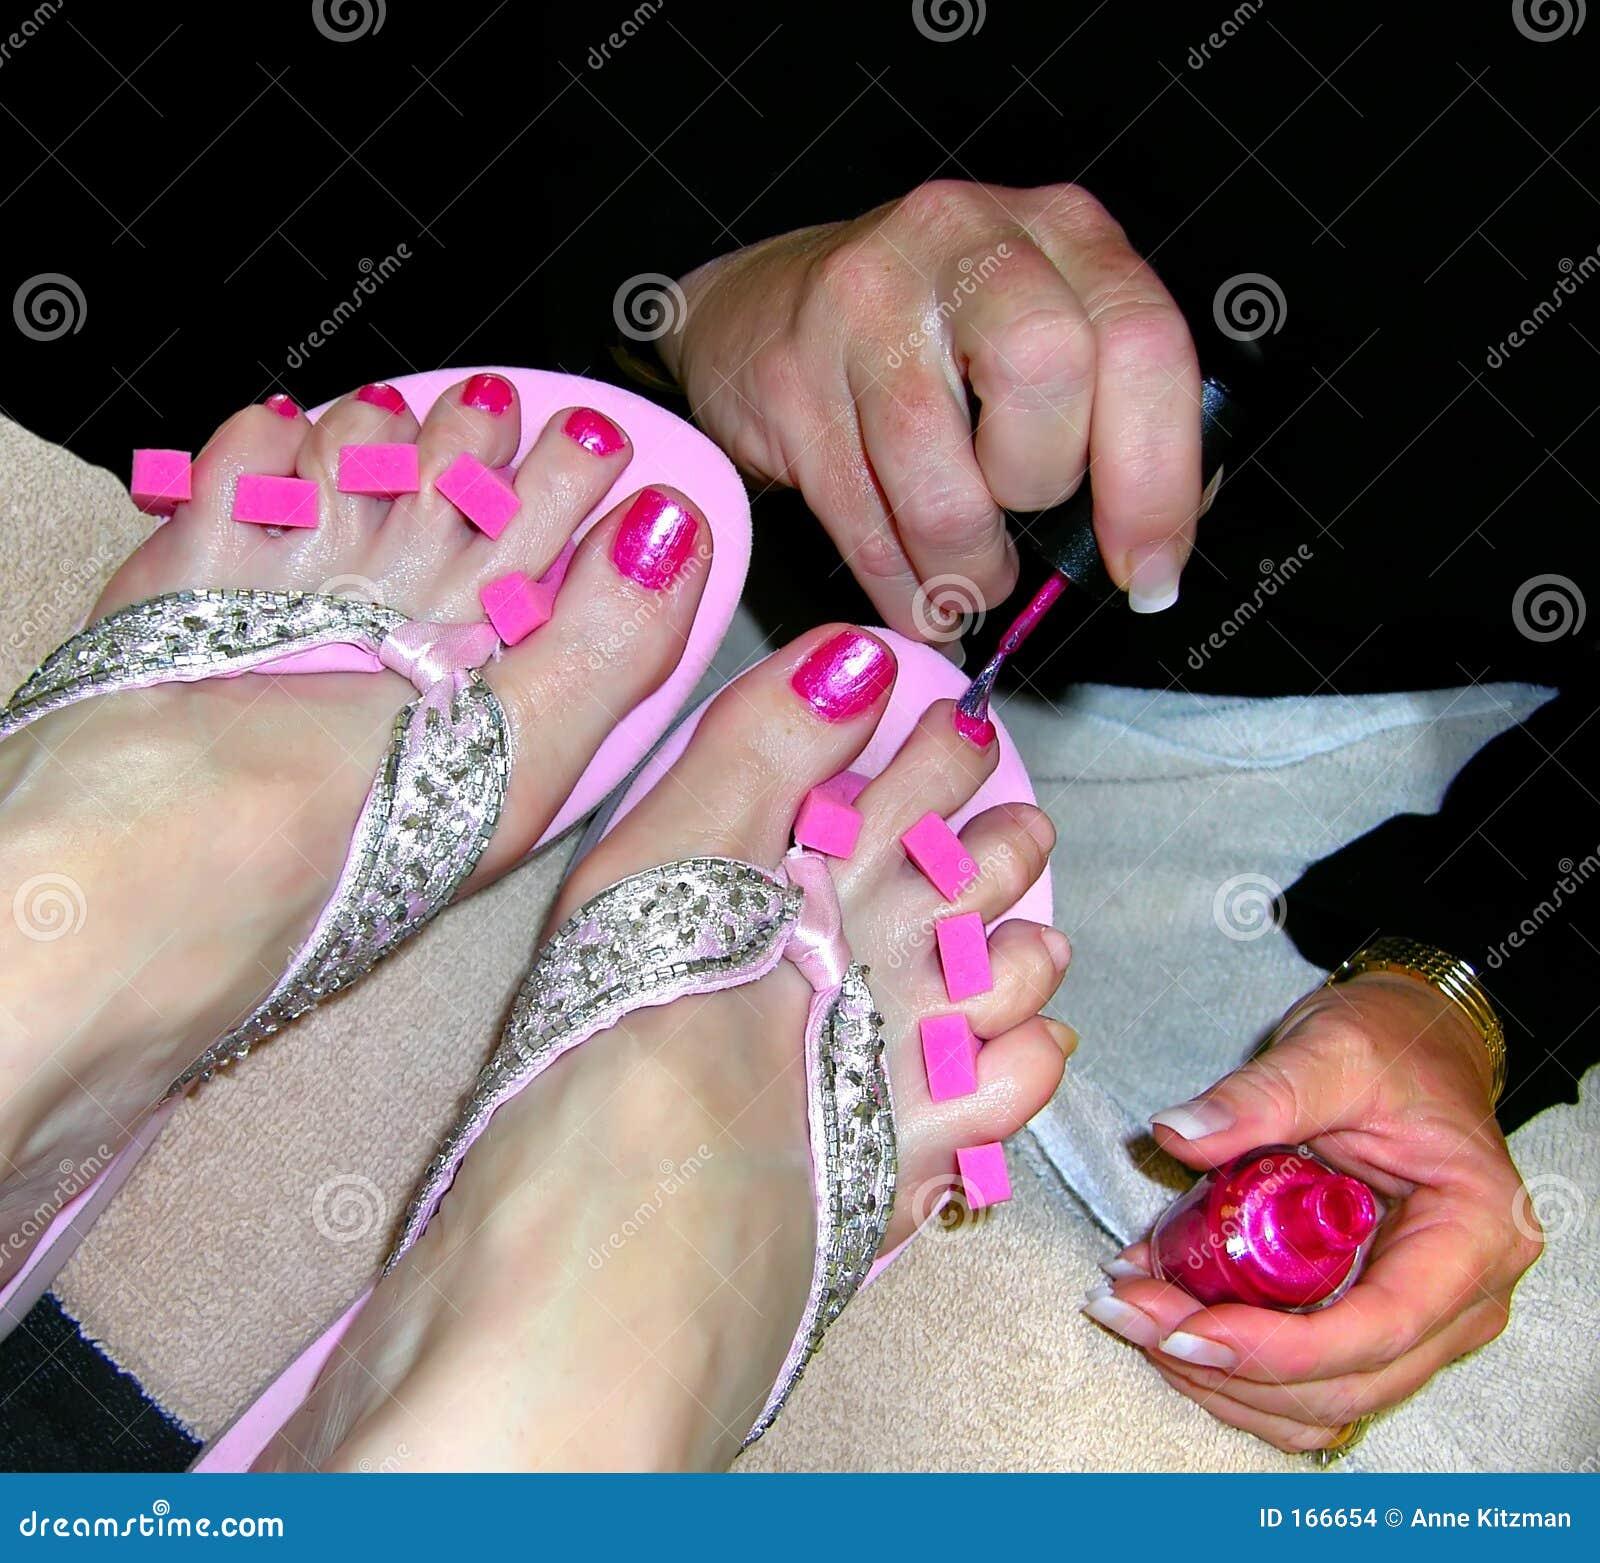 9cba4b445a78 Pedicure - Pink Toenails stock photo. Image of pedicure - 166654